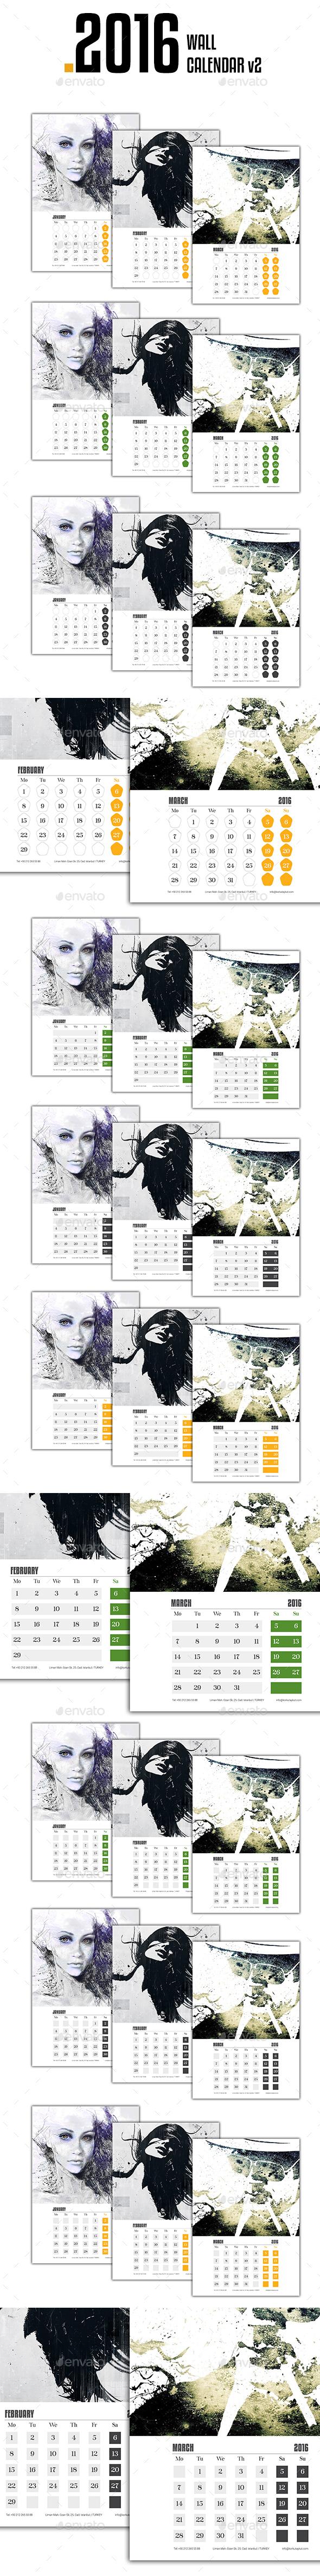 Wall Calendar 2016 v2 - Calendars Stationery